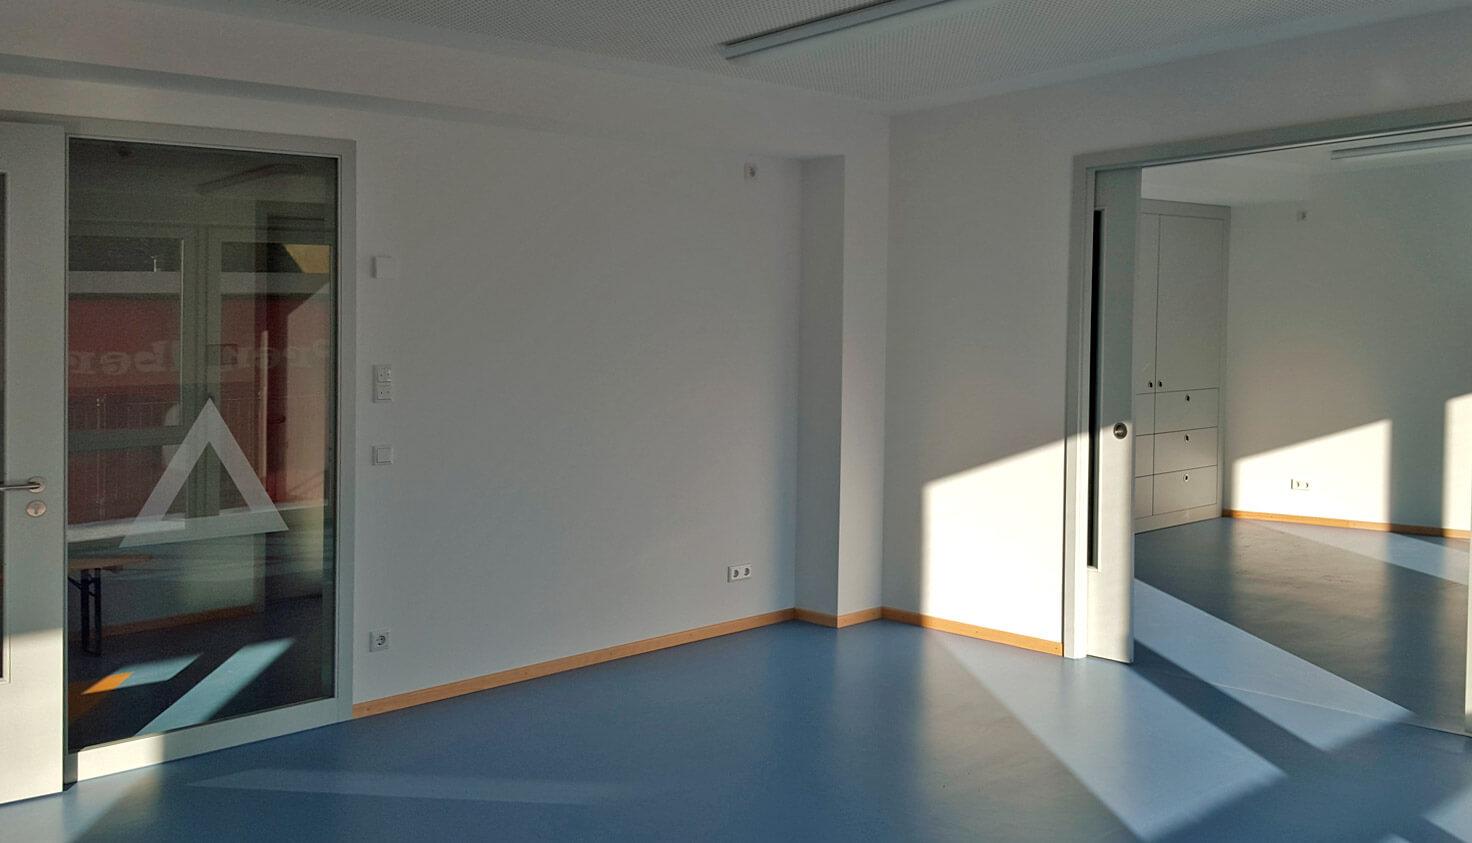 Kita Pappelallee - Referenz Malerbetrieb Kluge Berlin